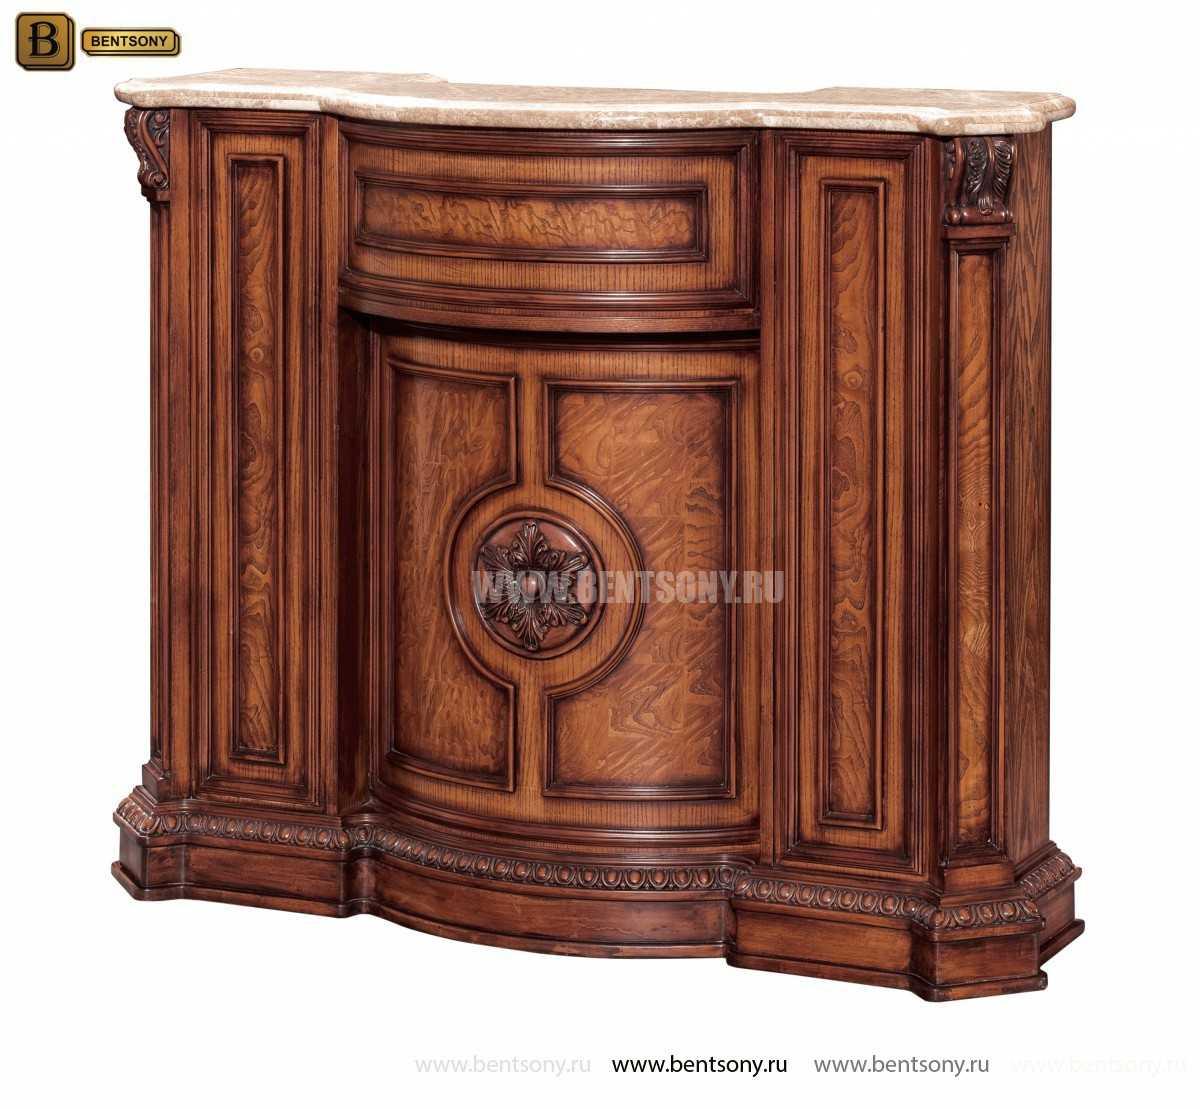 Барная стойка Монтана (Классика, столешница мрамор) каталог мебели с ценами